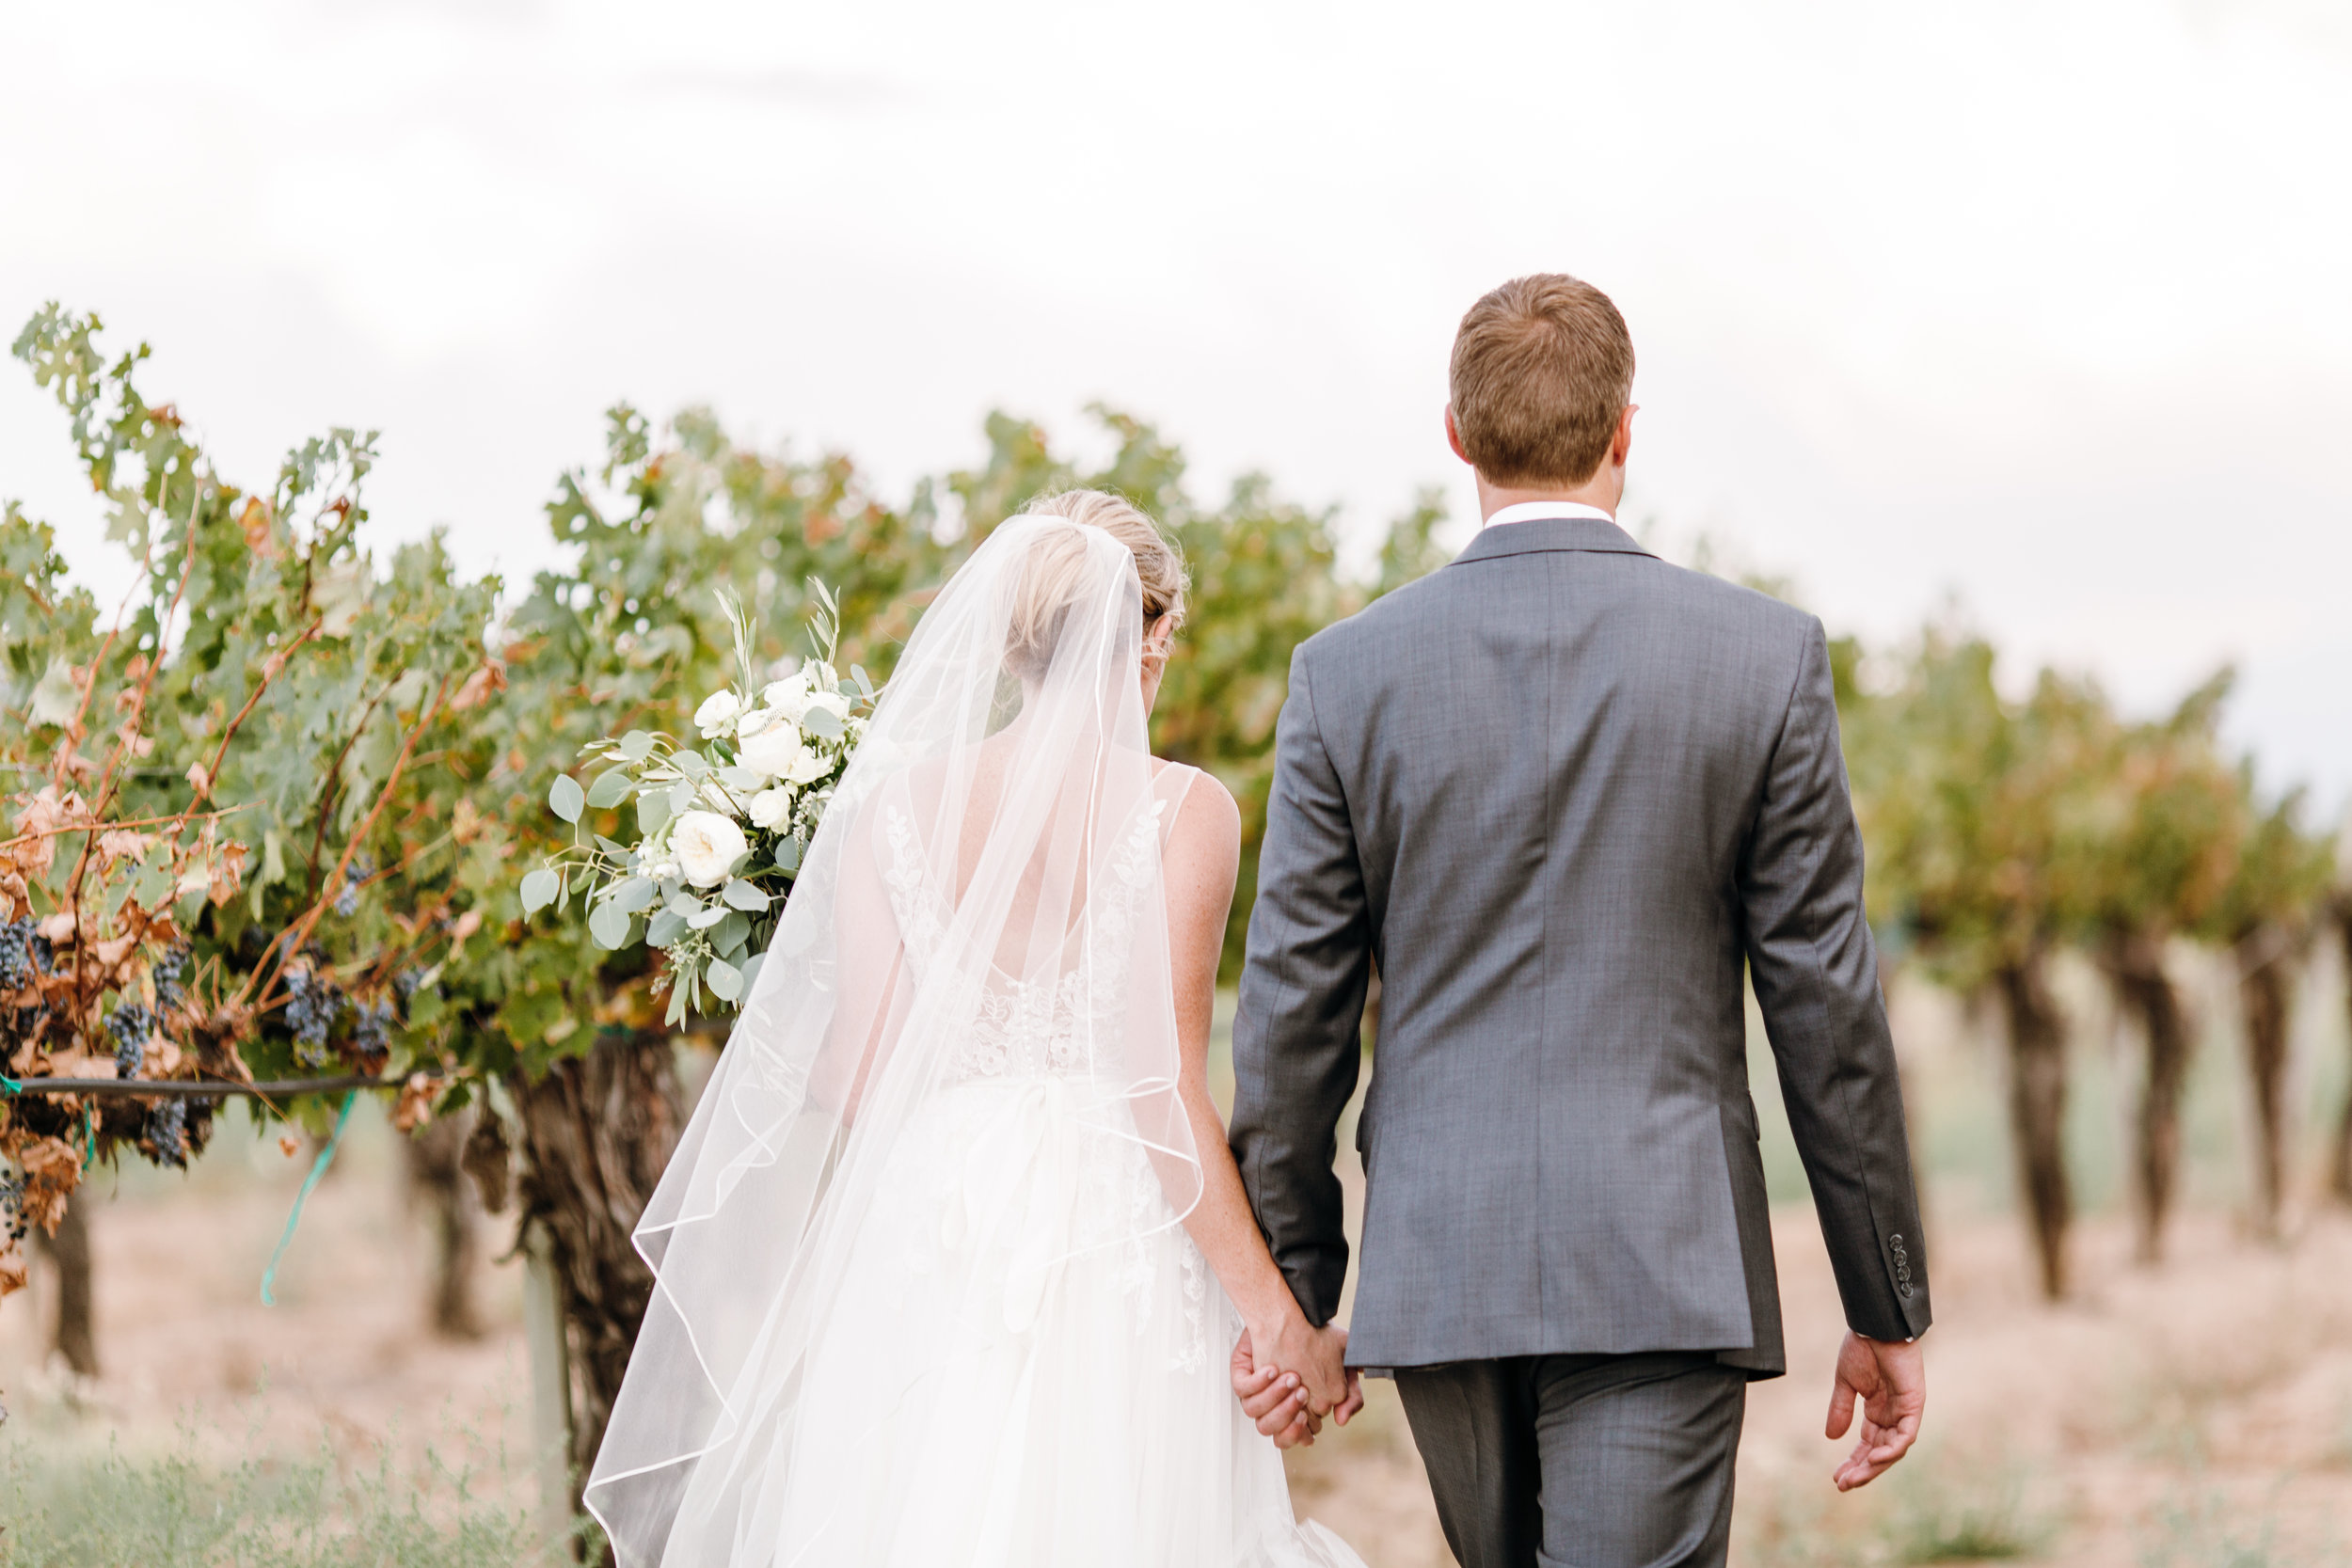 KaraNixonWeddings-Temecula-Wedding-58.jpg